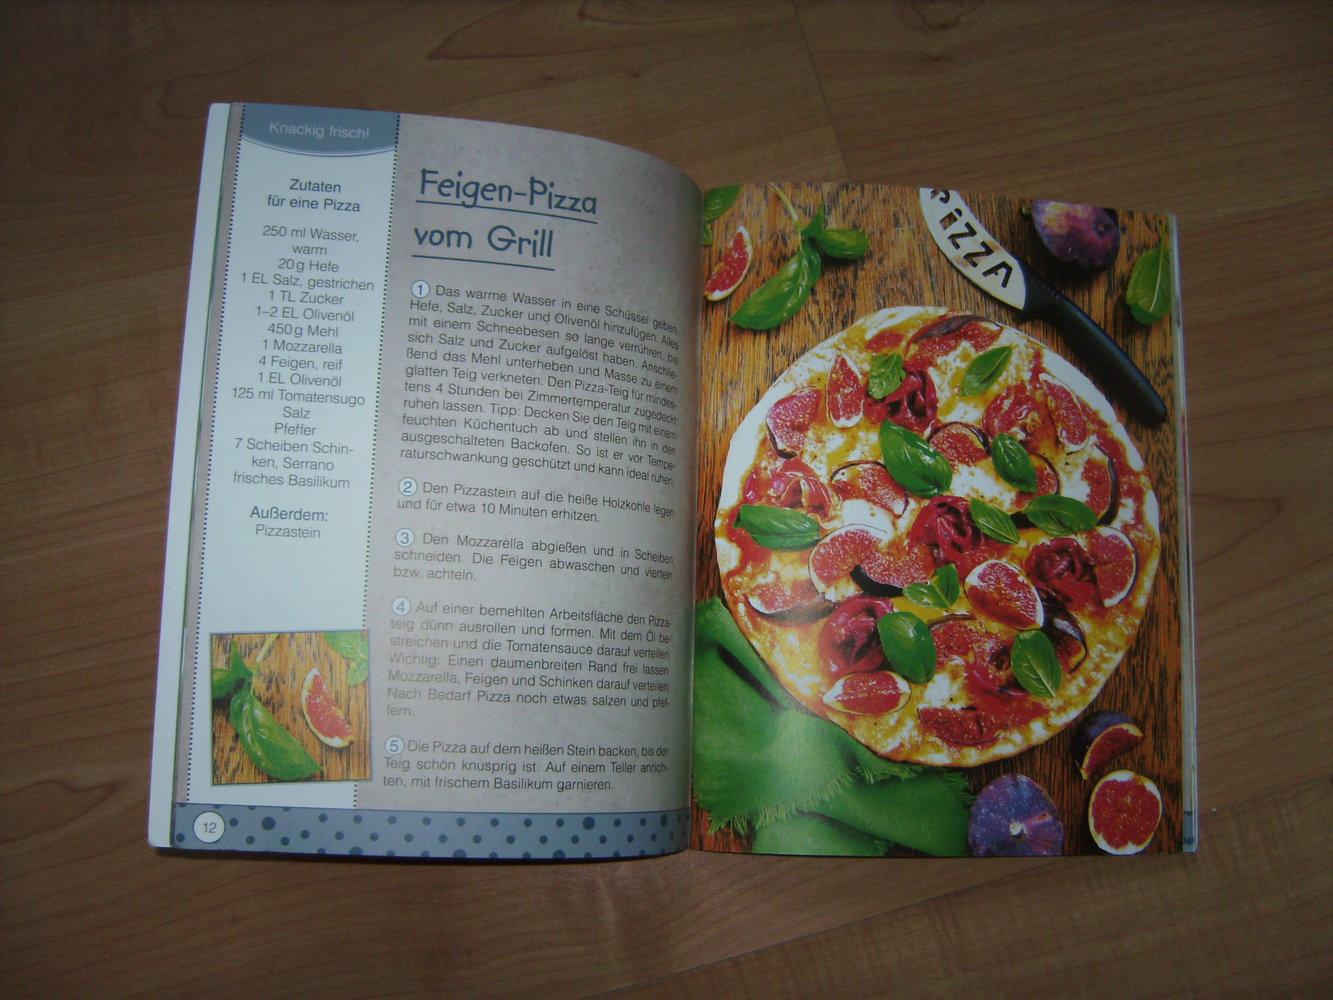 Sommerküche Kochen : Grillrezepte kochbuch grillen sommerküche grill rezeptheft